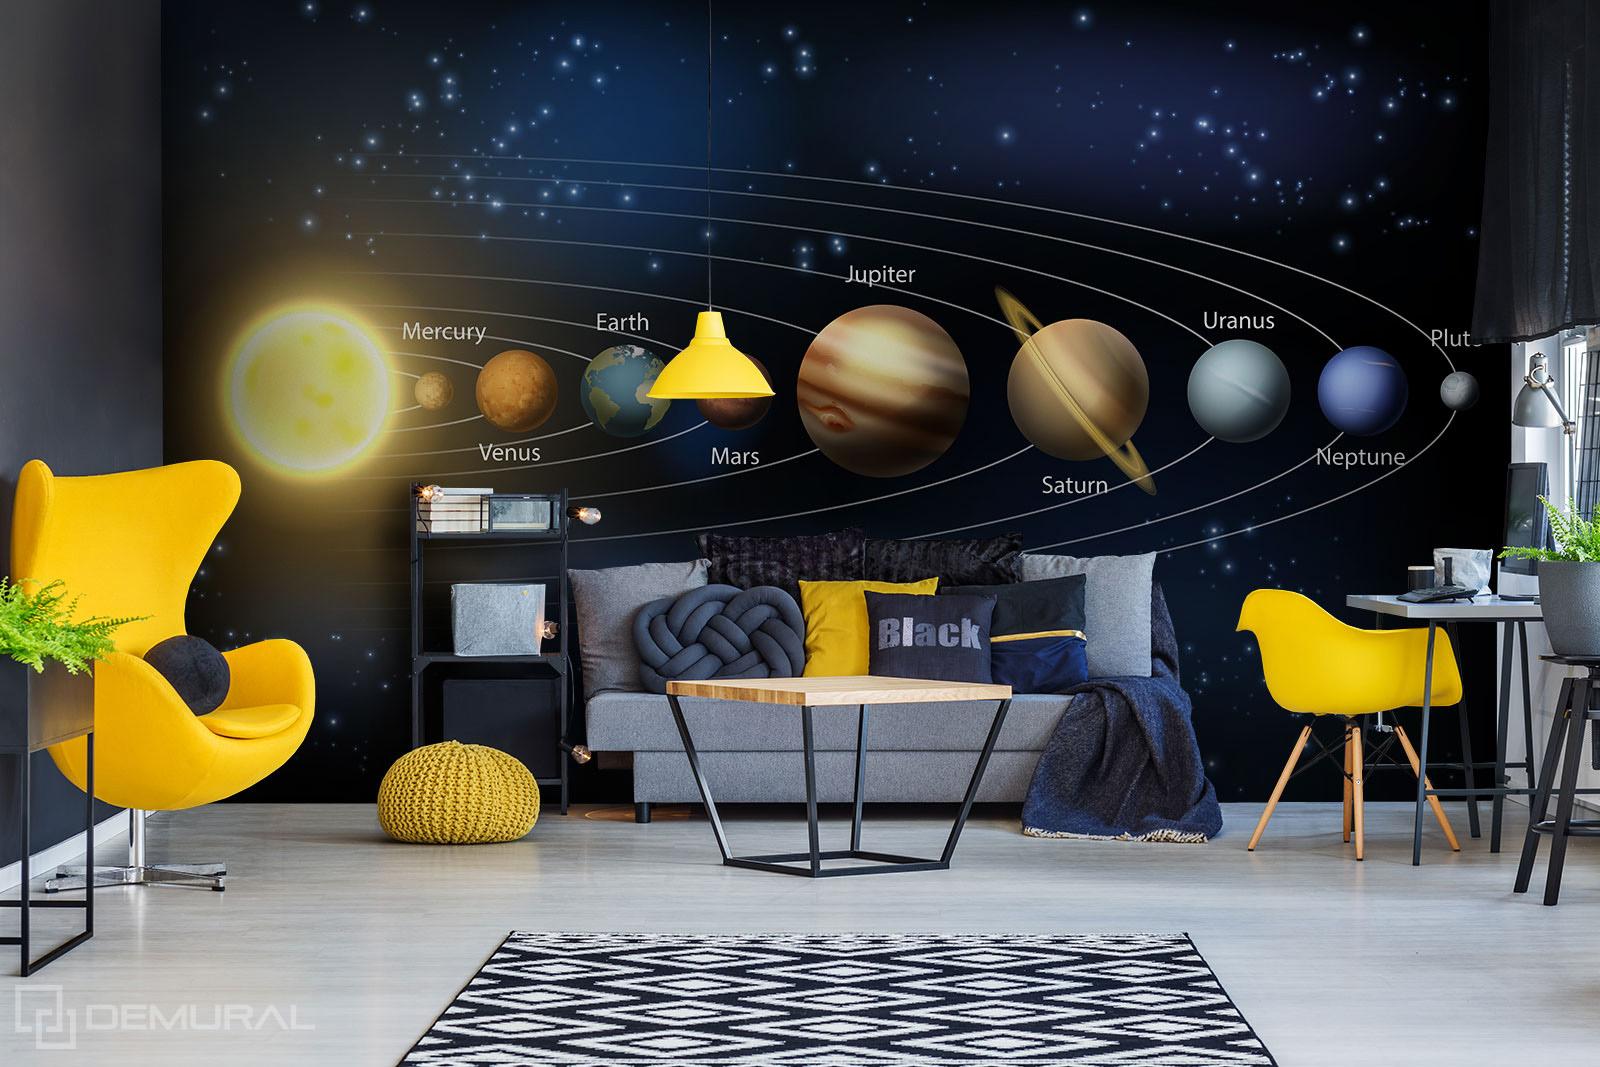 Photo wallapaper Solar System - Photo wallpaper cosmos - Demural